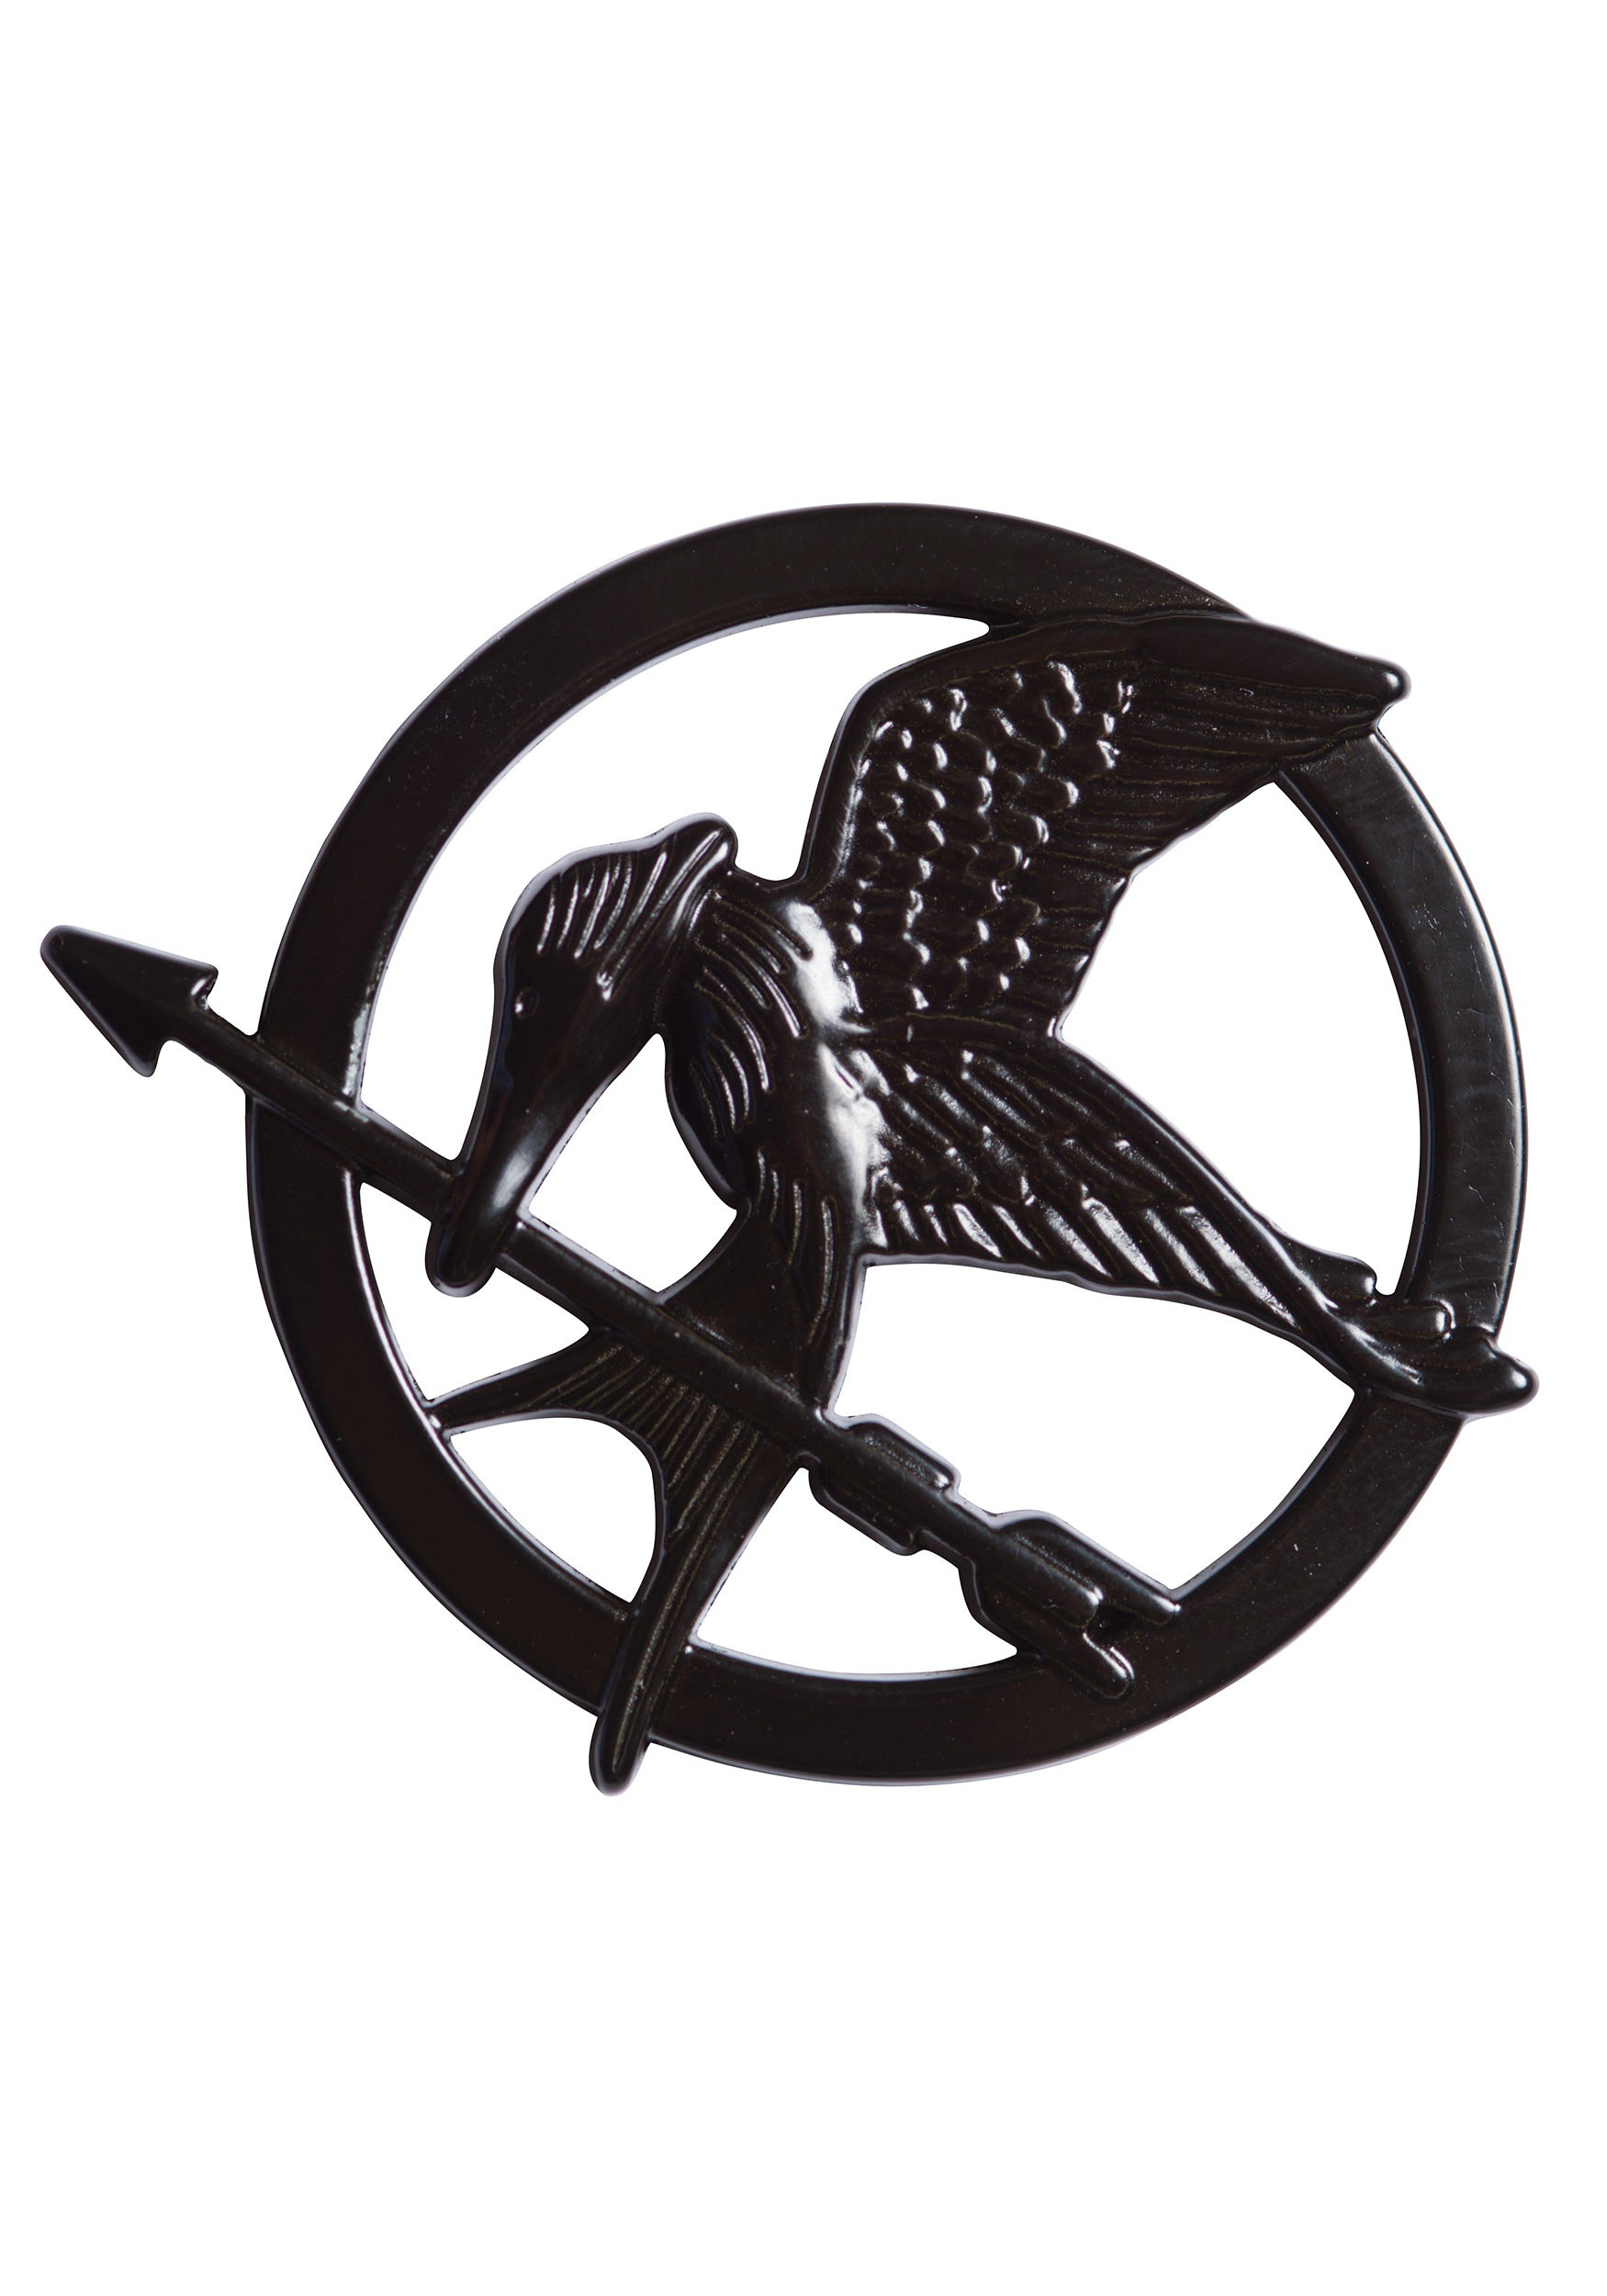 The Hunger Games Mockingjay Pin RU32553